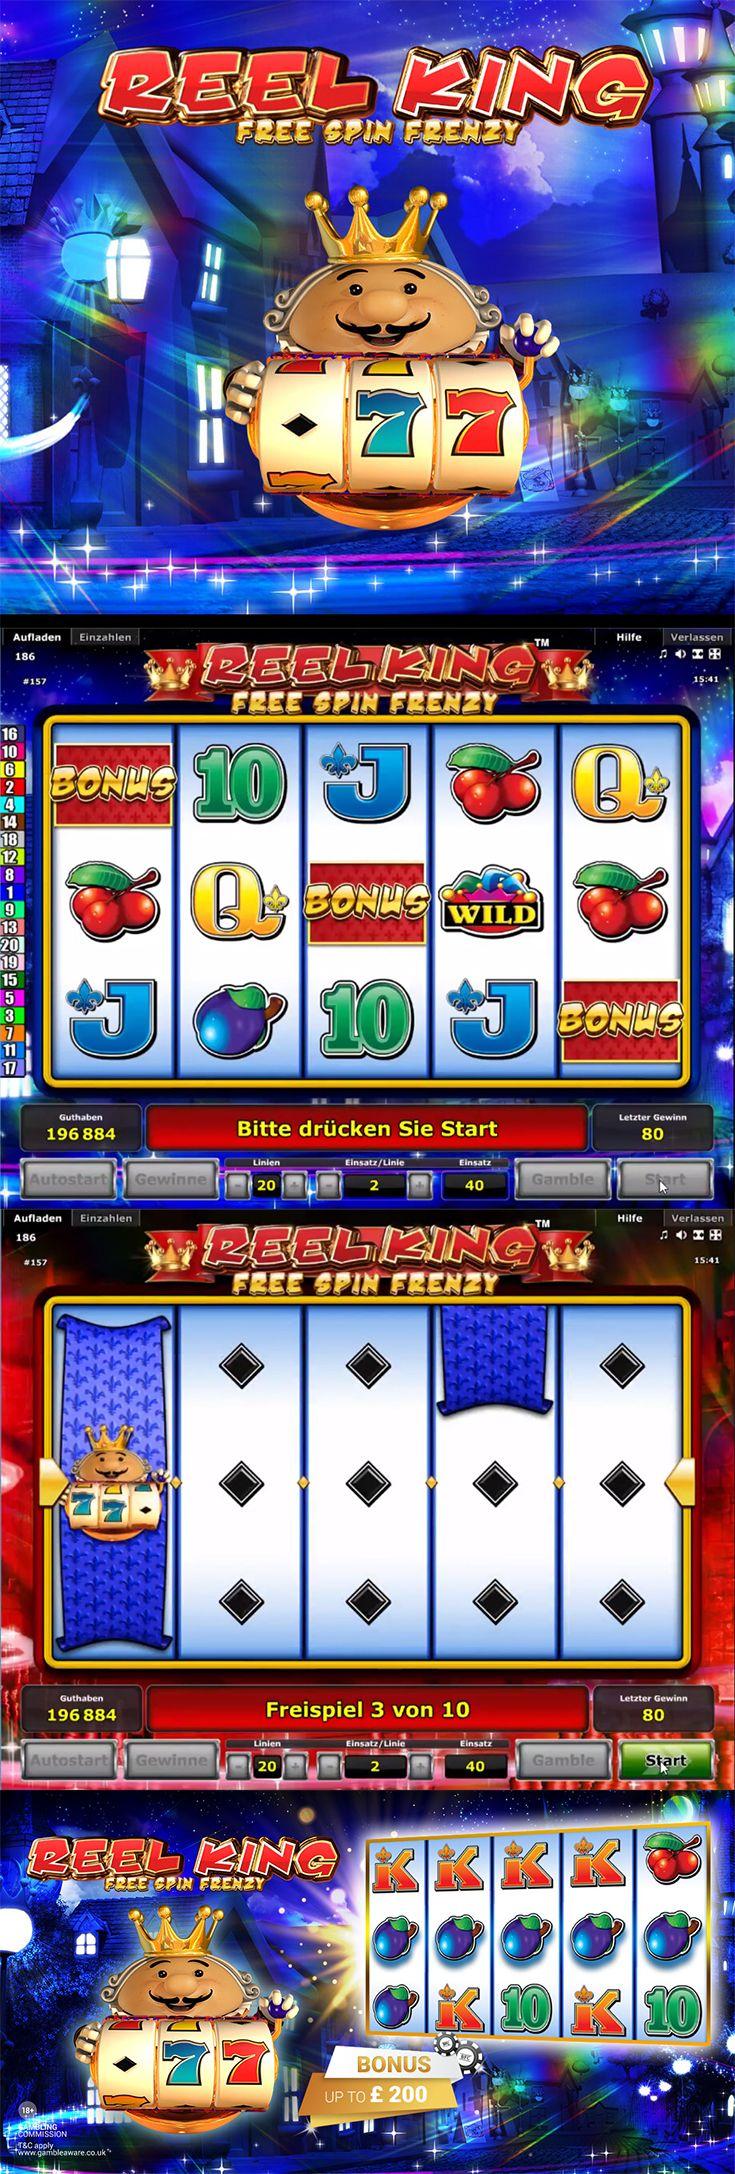 Frenzy казино пула казино